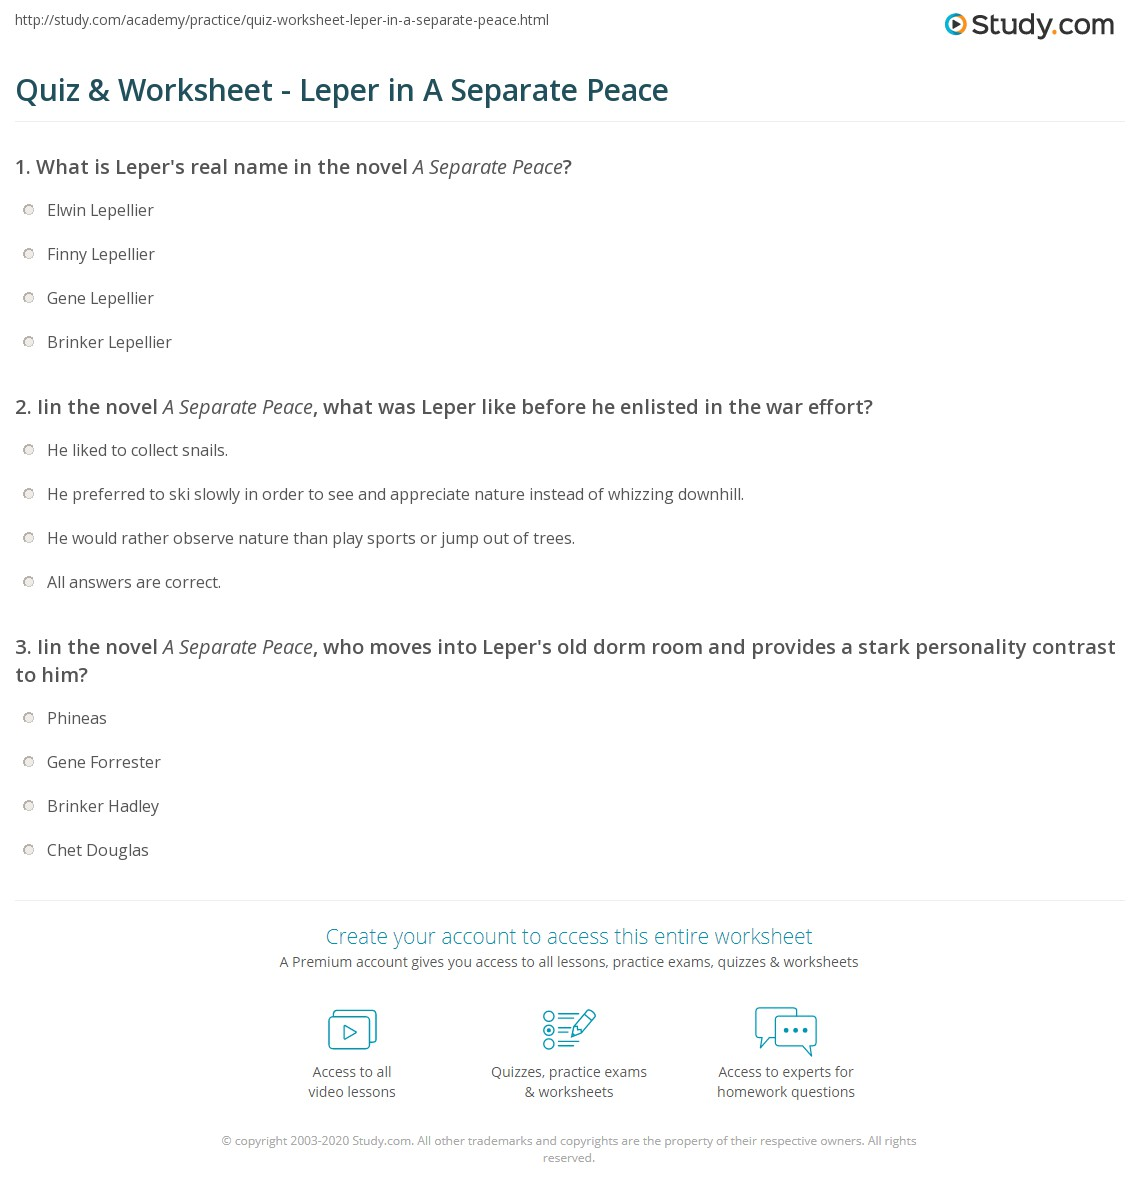 Quiz & Worksheet - Leper in A Separate Peace | Study.com